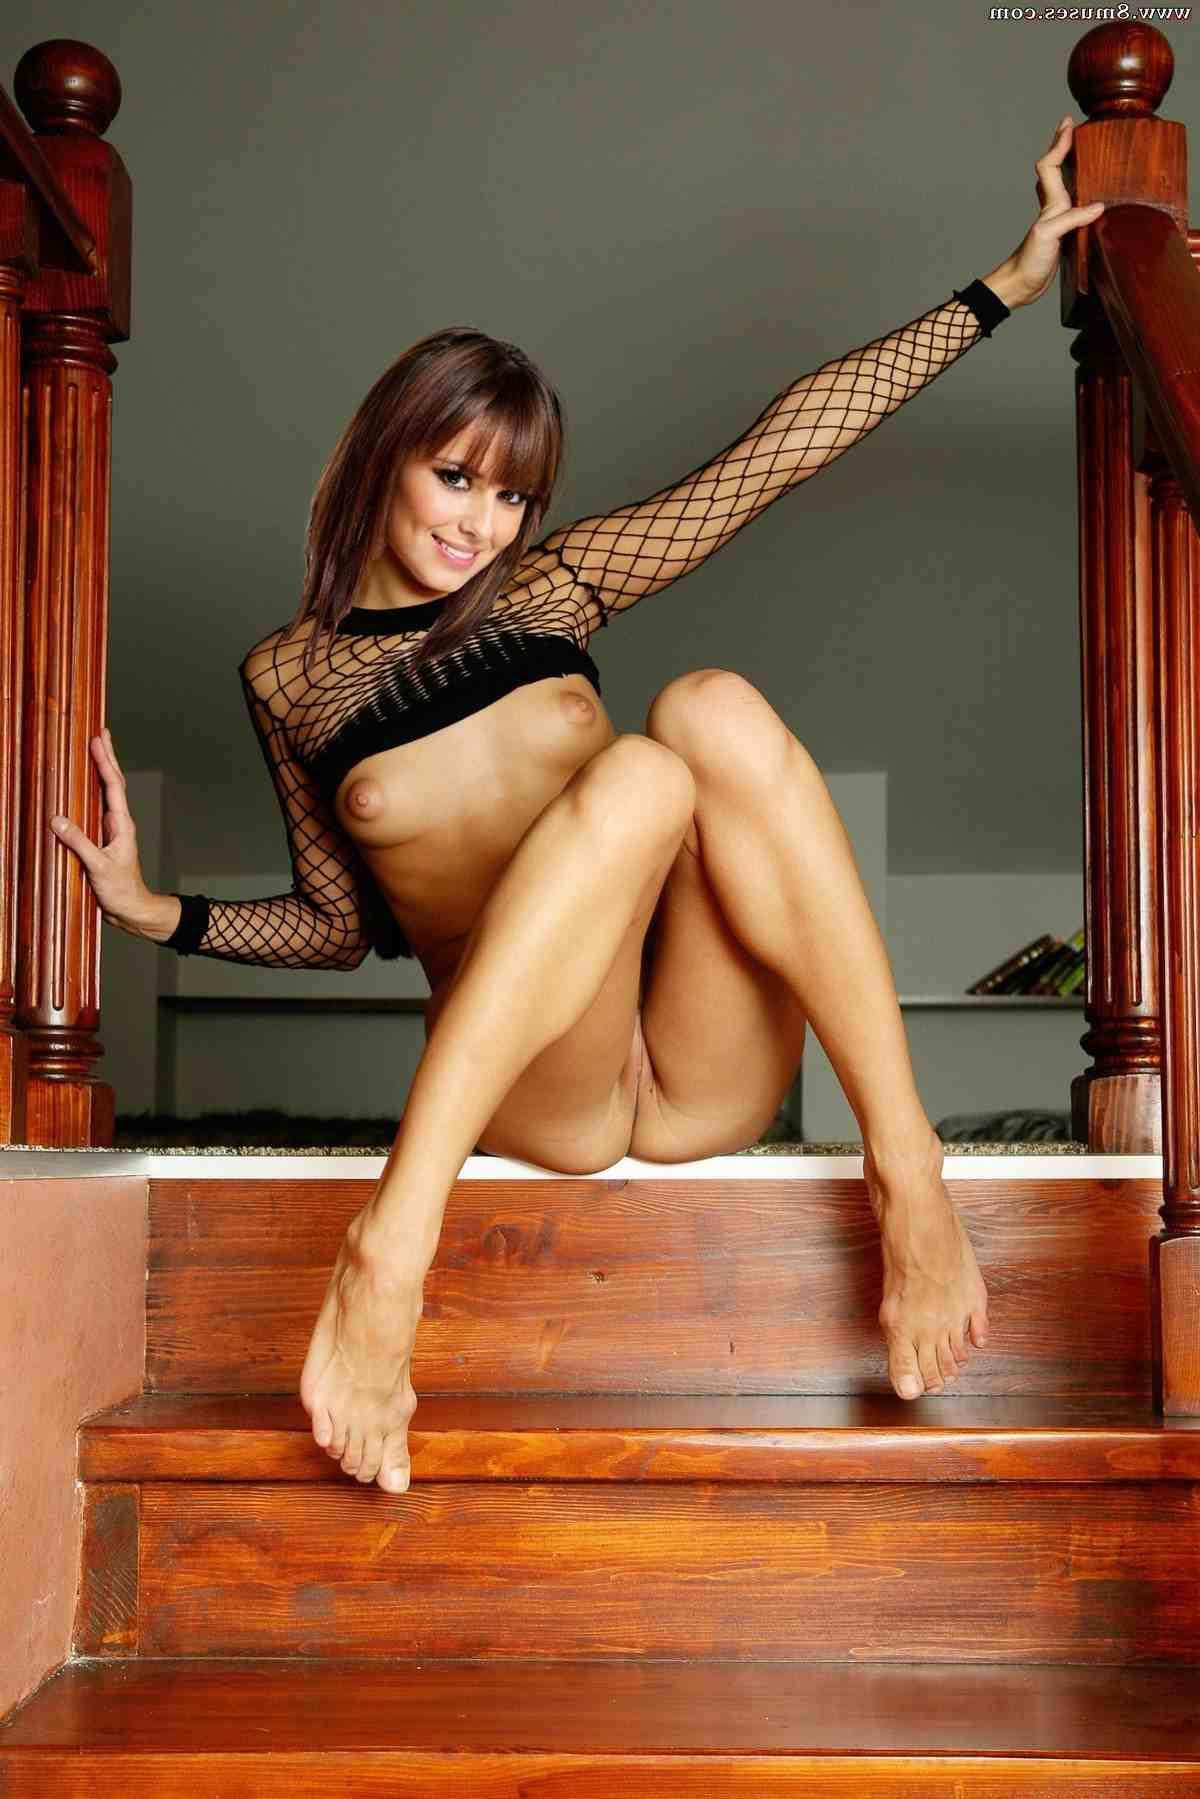 Fake-Celebrities-Sex-Pictures/Cheryl-Tweedy Cheryl__Tweedy__8muses_-_Sex_and_Porn_Comics_89.jpg